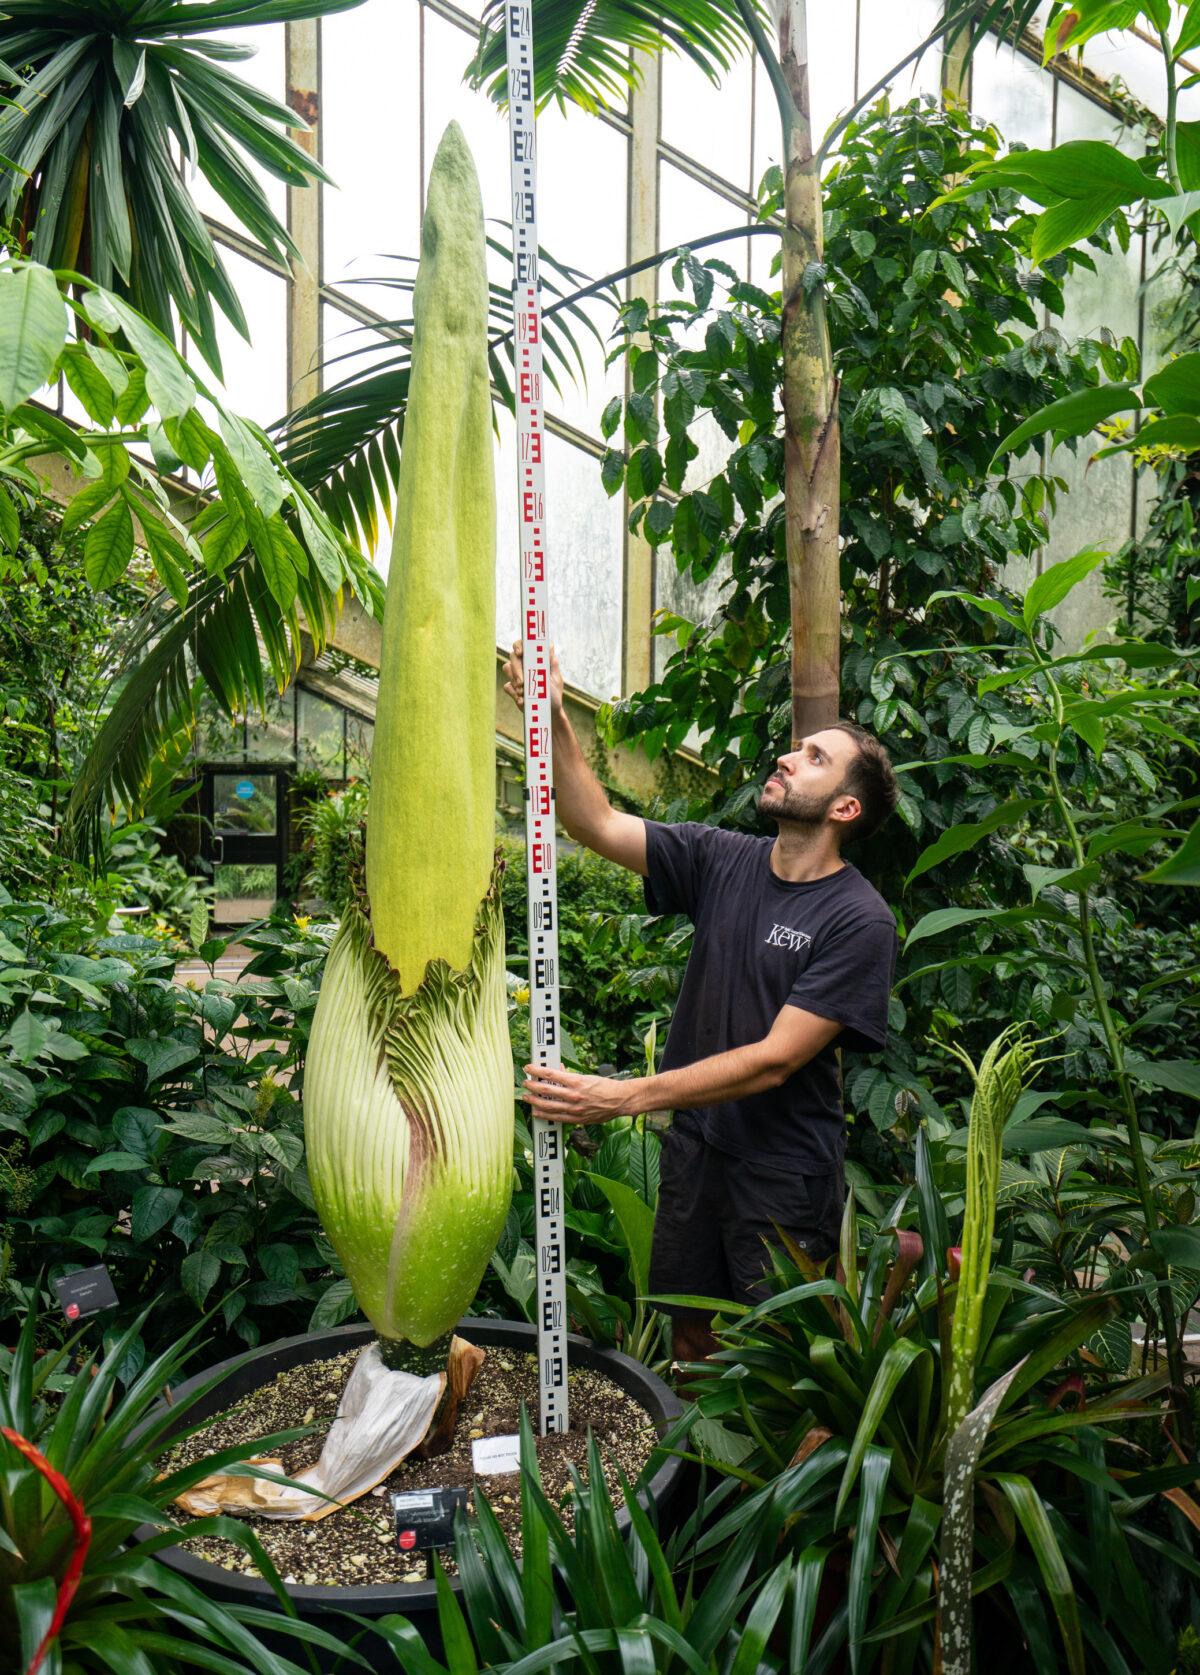 Kew Gardens - Guinness World Record